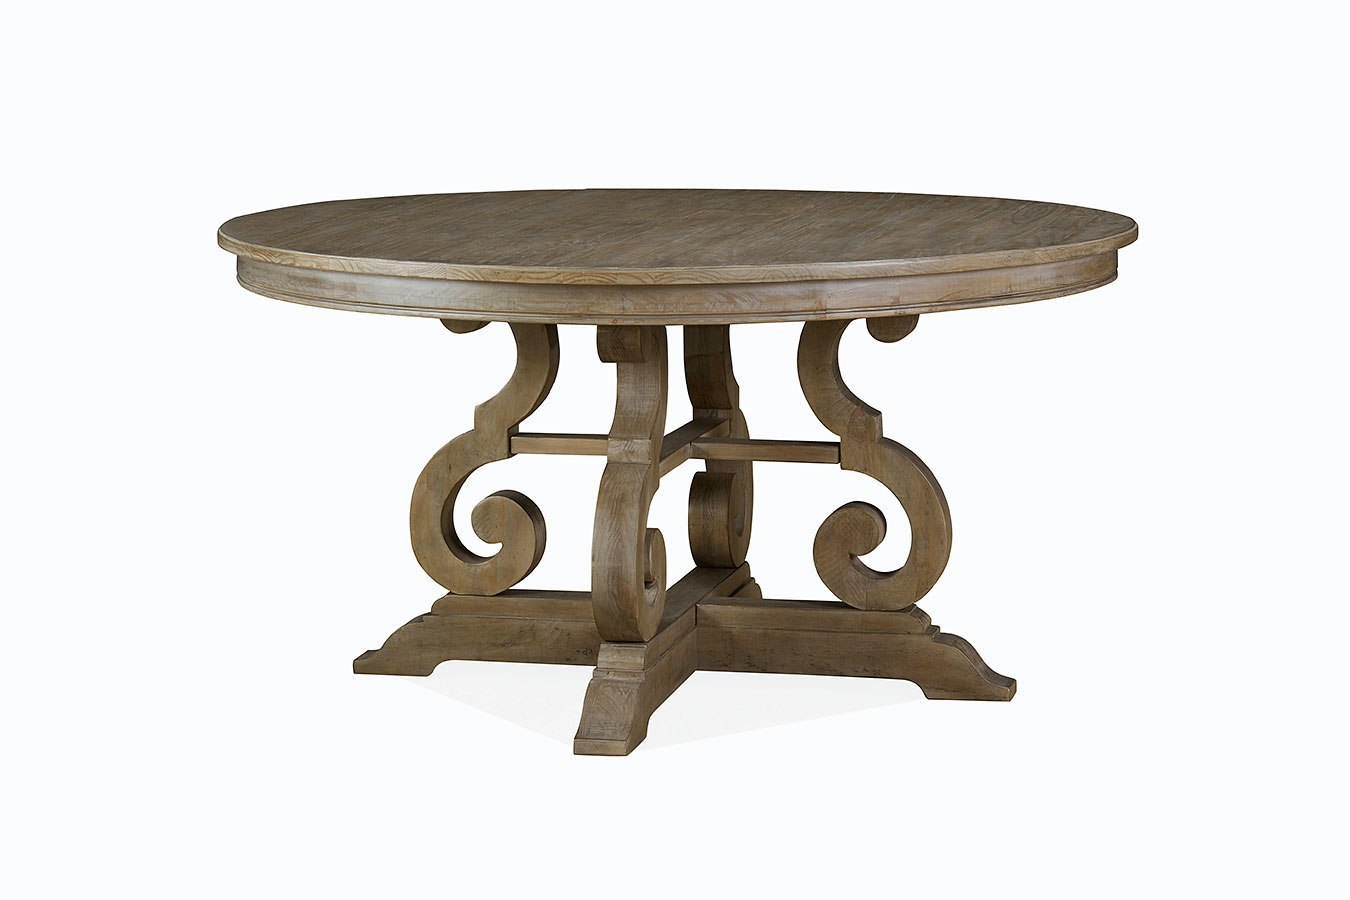 Tinley Park 60 Inch Round Dining Table By Magnussen Furniturepick